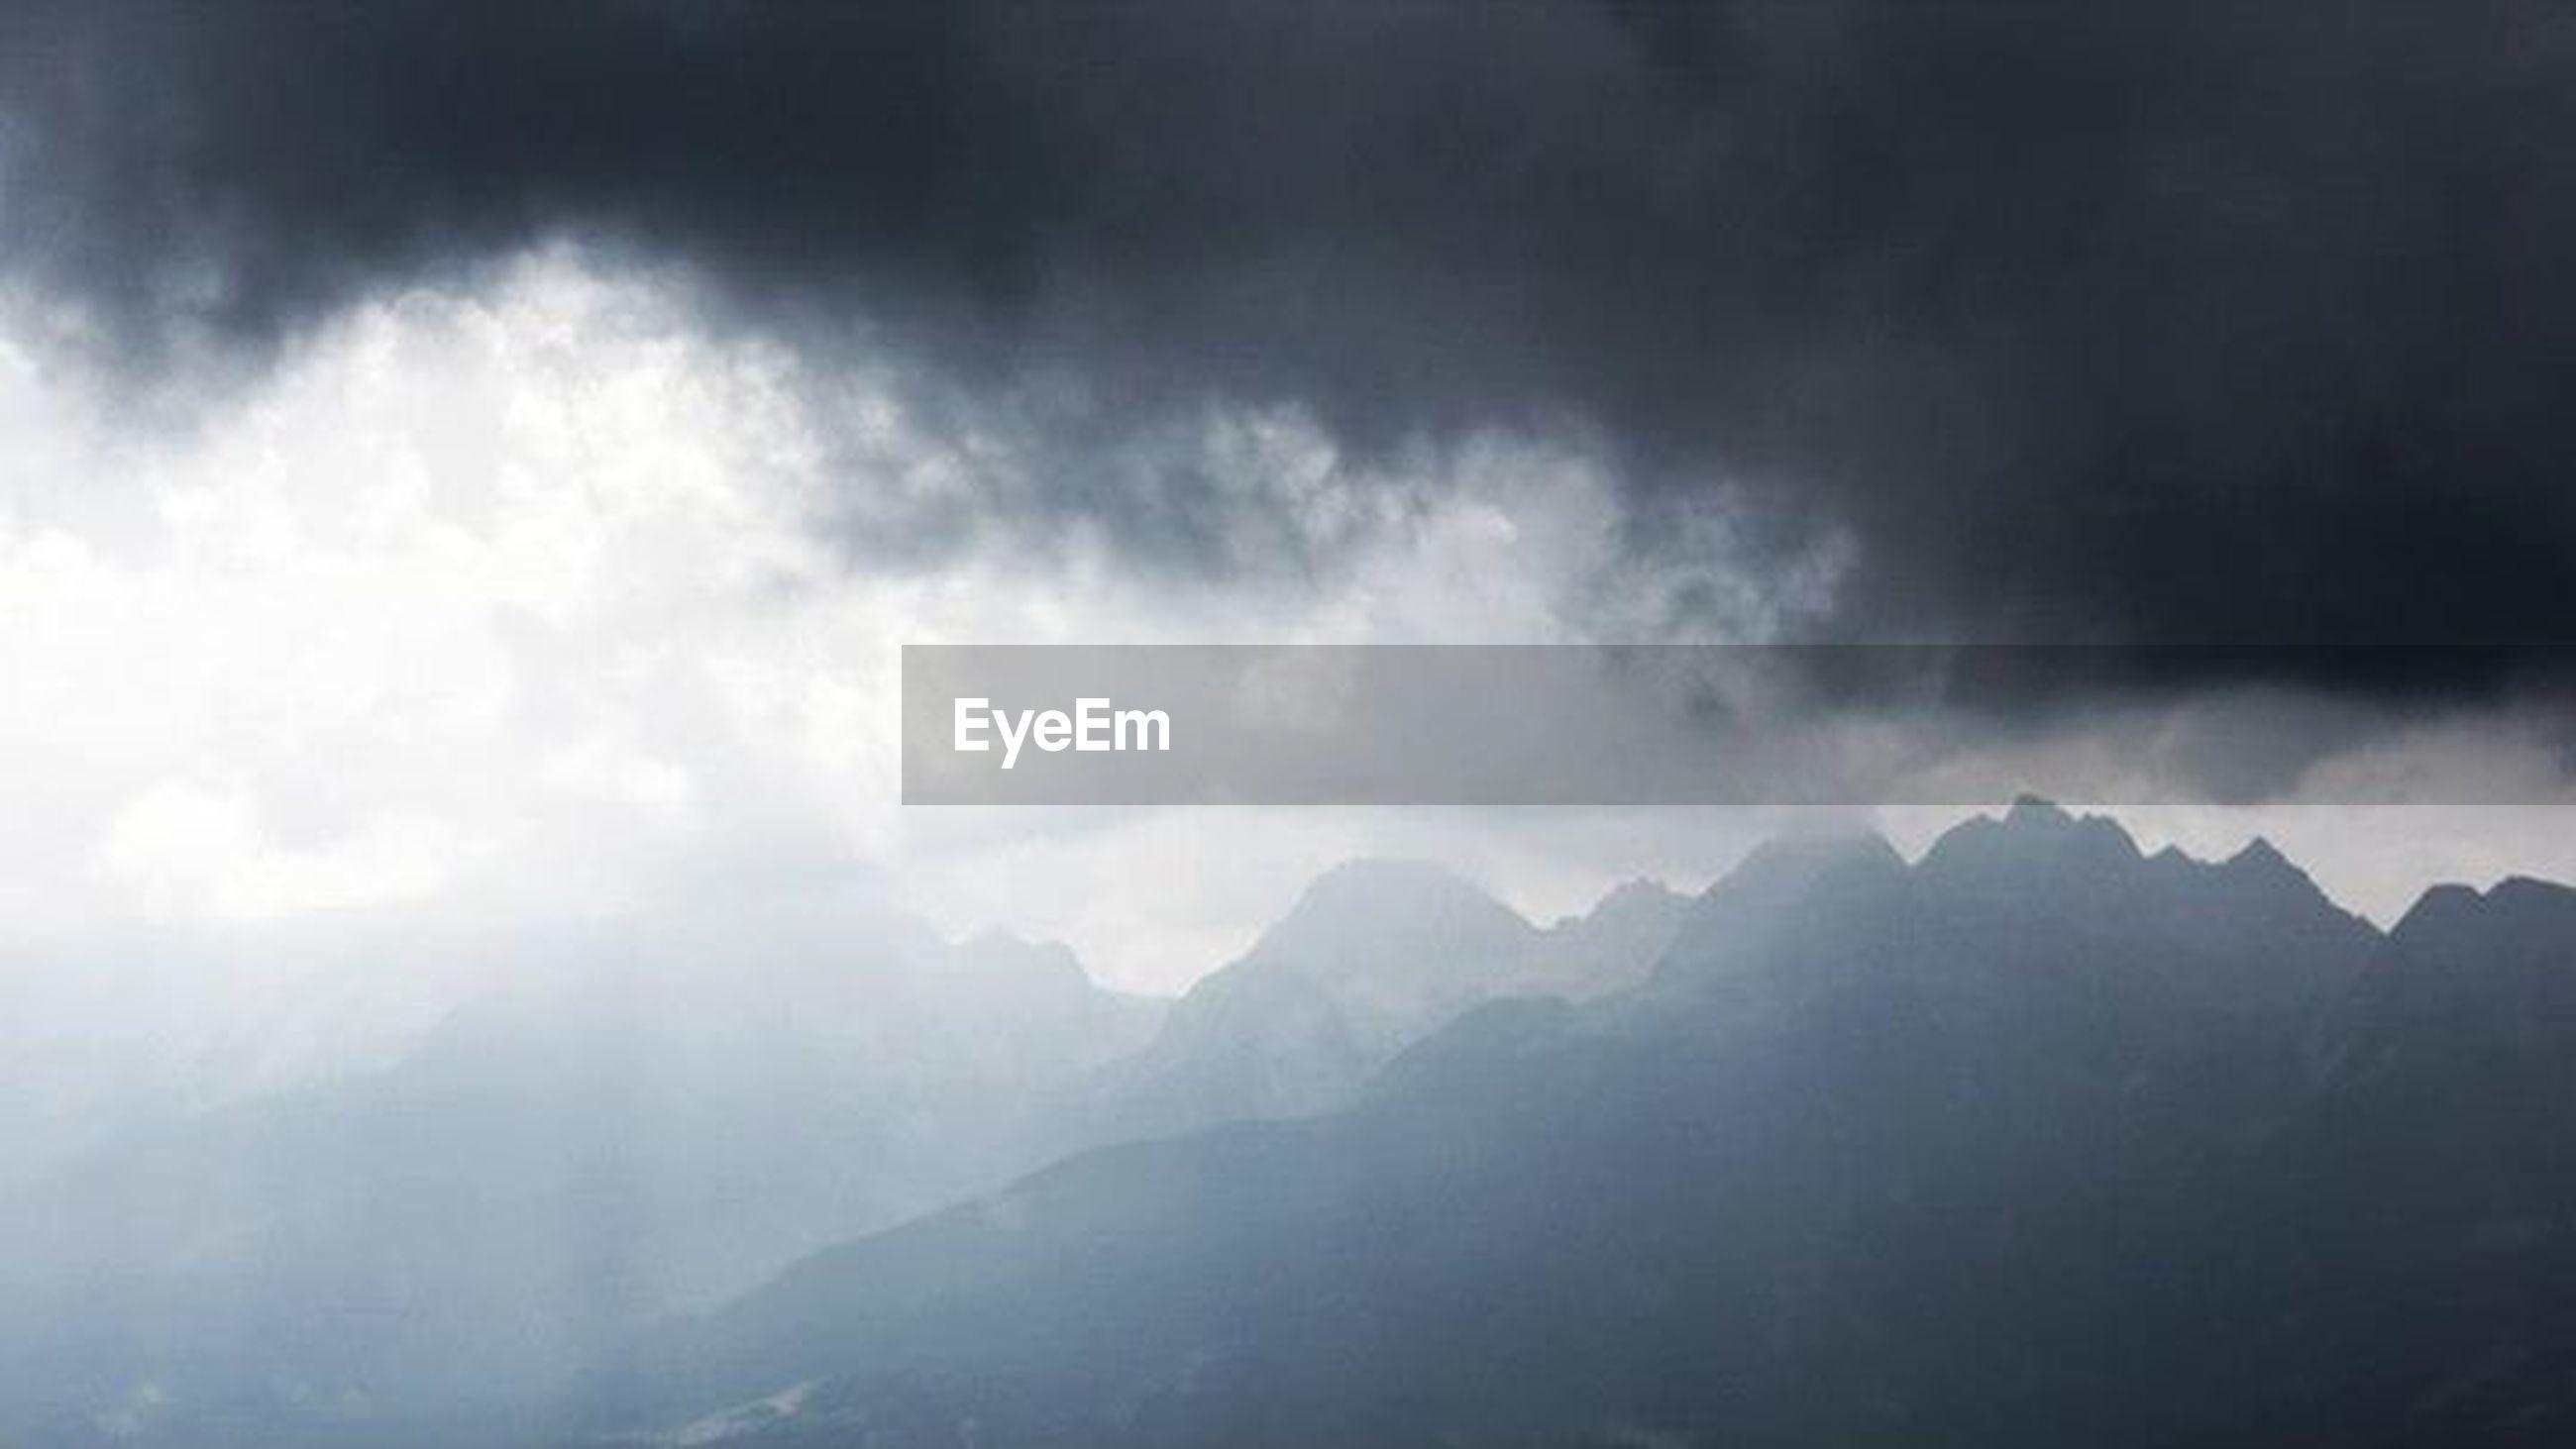 mountain, scenics, sky, cloud - sky, weather, tranquil scene, beauty in nature, cloudy, tranquility, mountain range, nature, overcast, landscape, storm cloud, idyllic, fog, cloud, non-urban scene, majestic, cloudscape